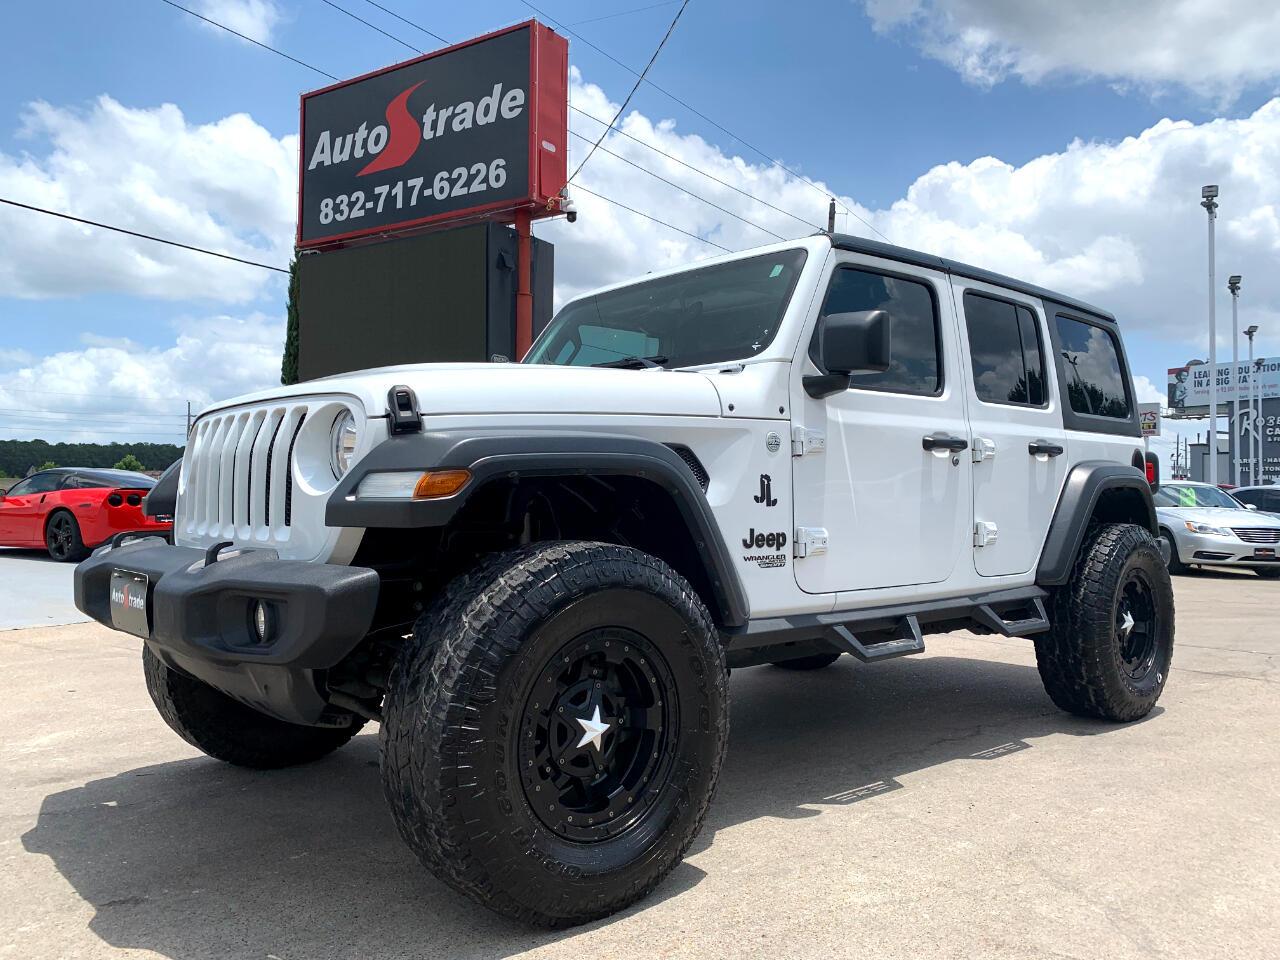 Jeep Wrangler Unlimited Sport S 4x4 2018